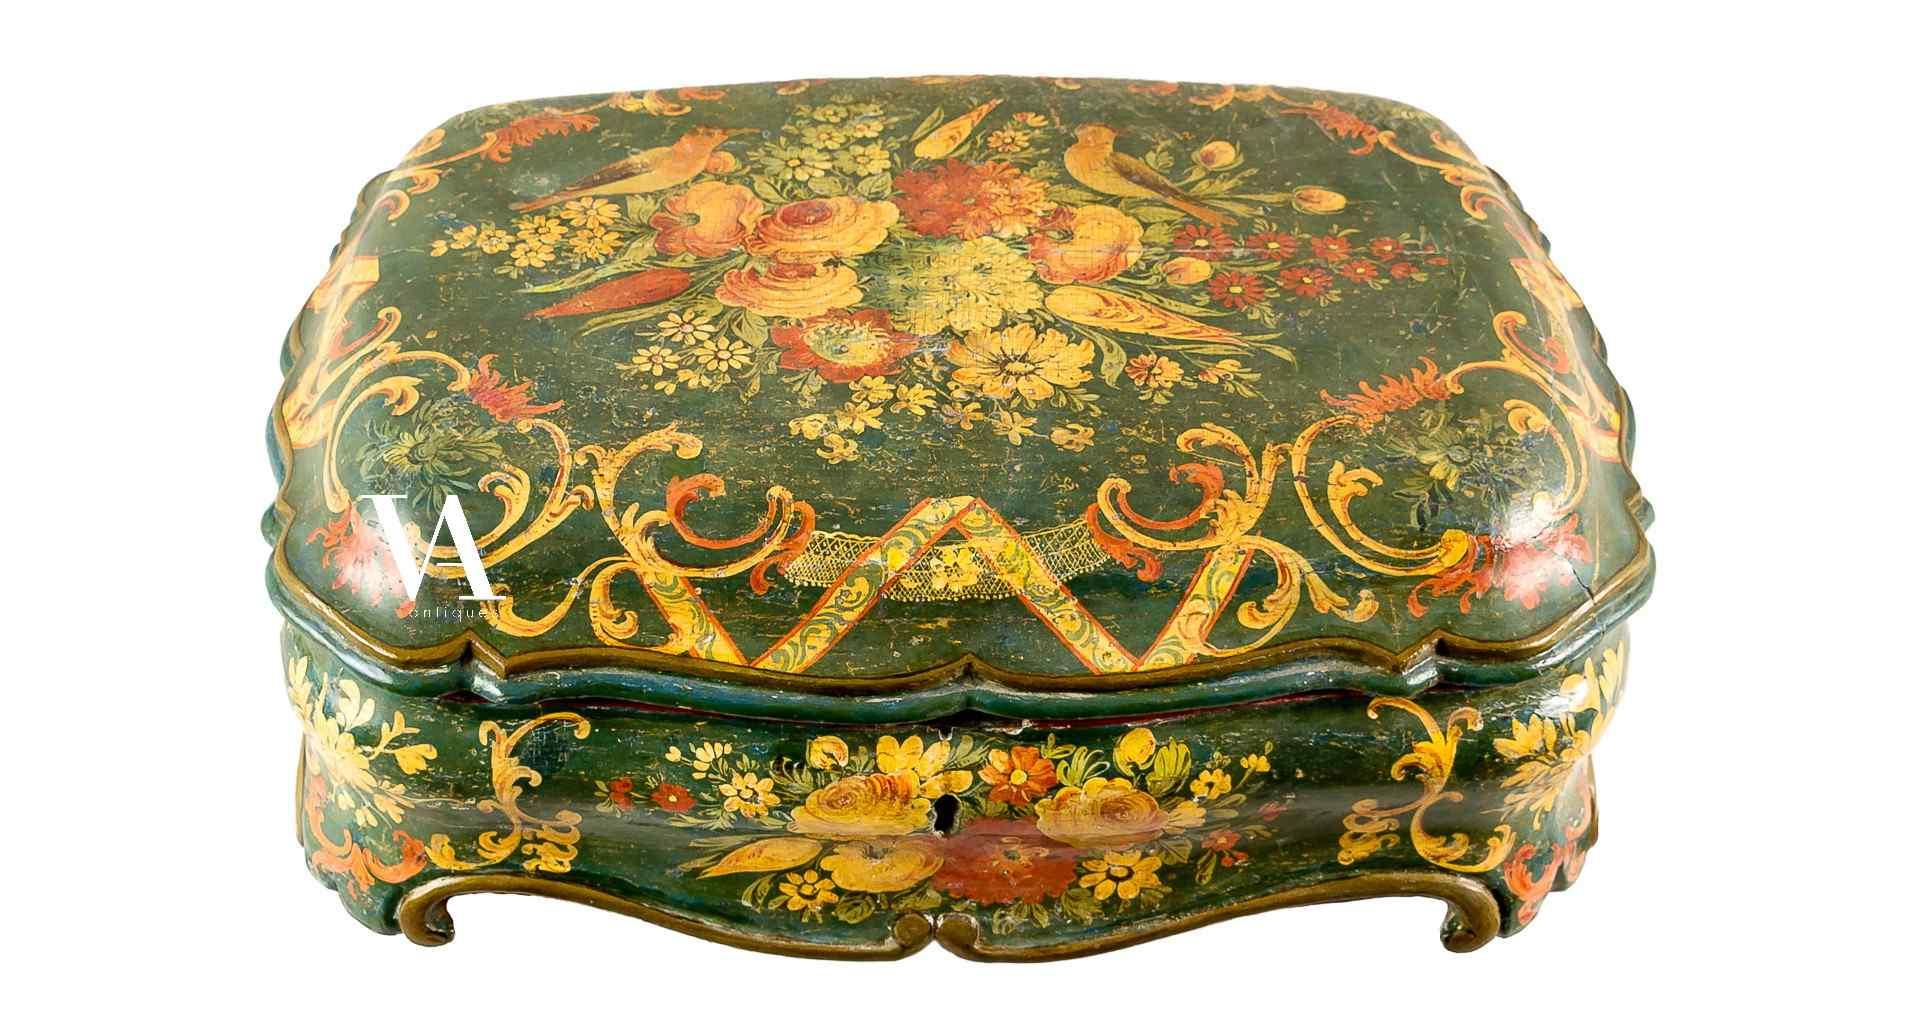 образная шкатулка. Венеция XVIII века.